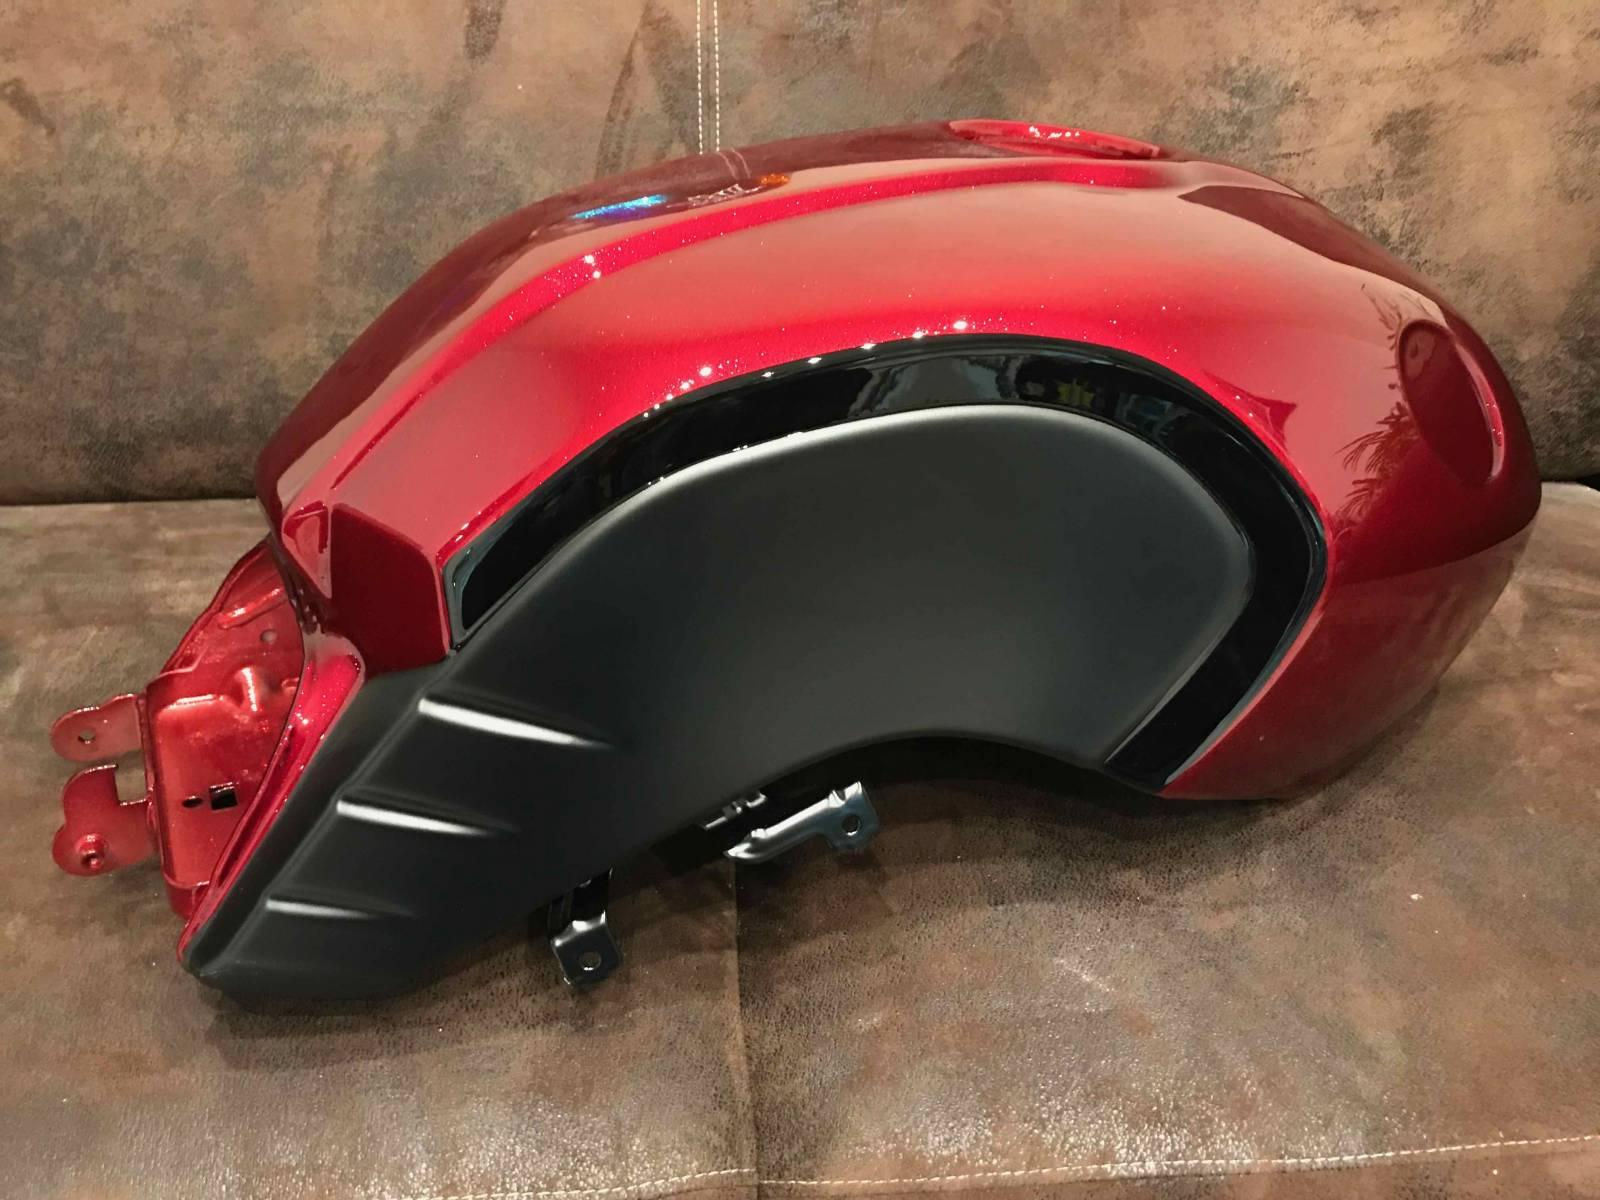 peinture nine t metal flake rouge peinture personnalis e pour moto la ciotat harley. Black Bedroom Furniture Sets. Home Design Ideas